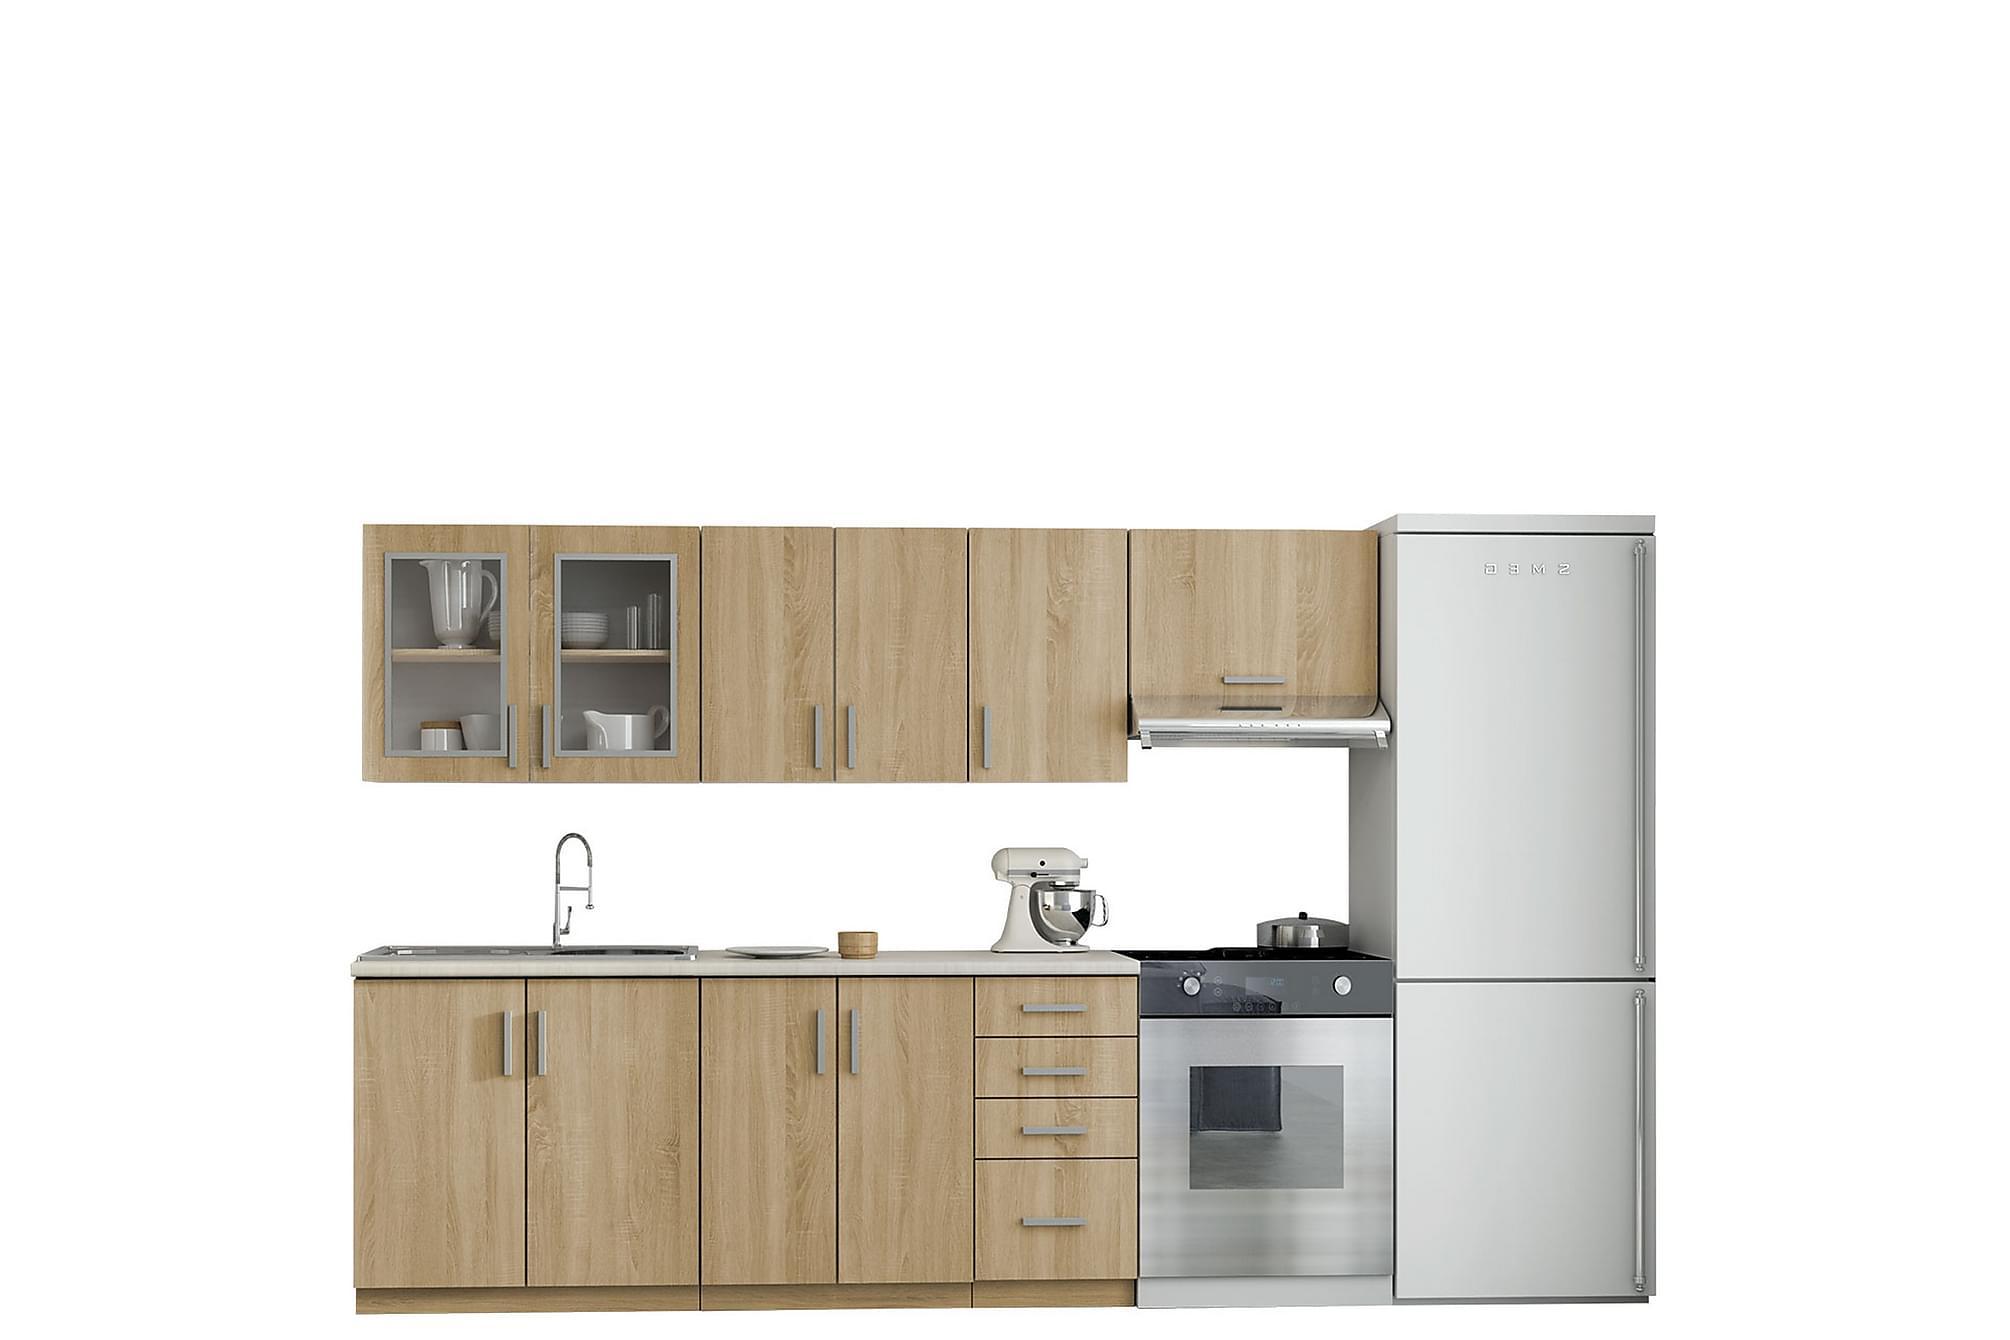 Köksmöbelset, Möbelset för kök & matplats